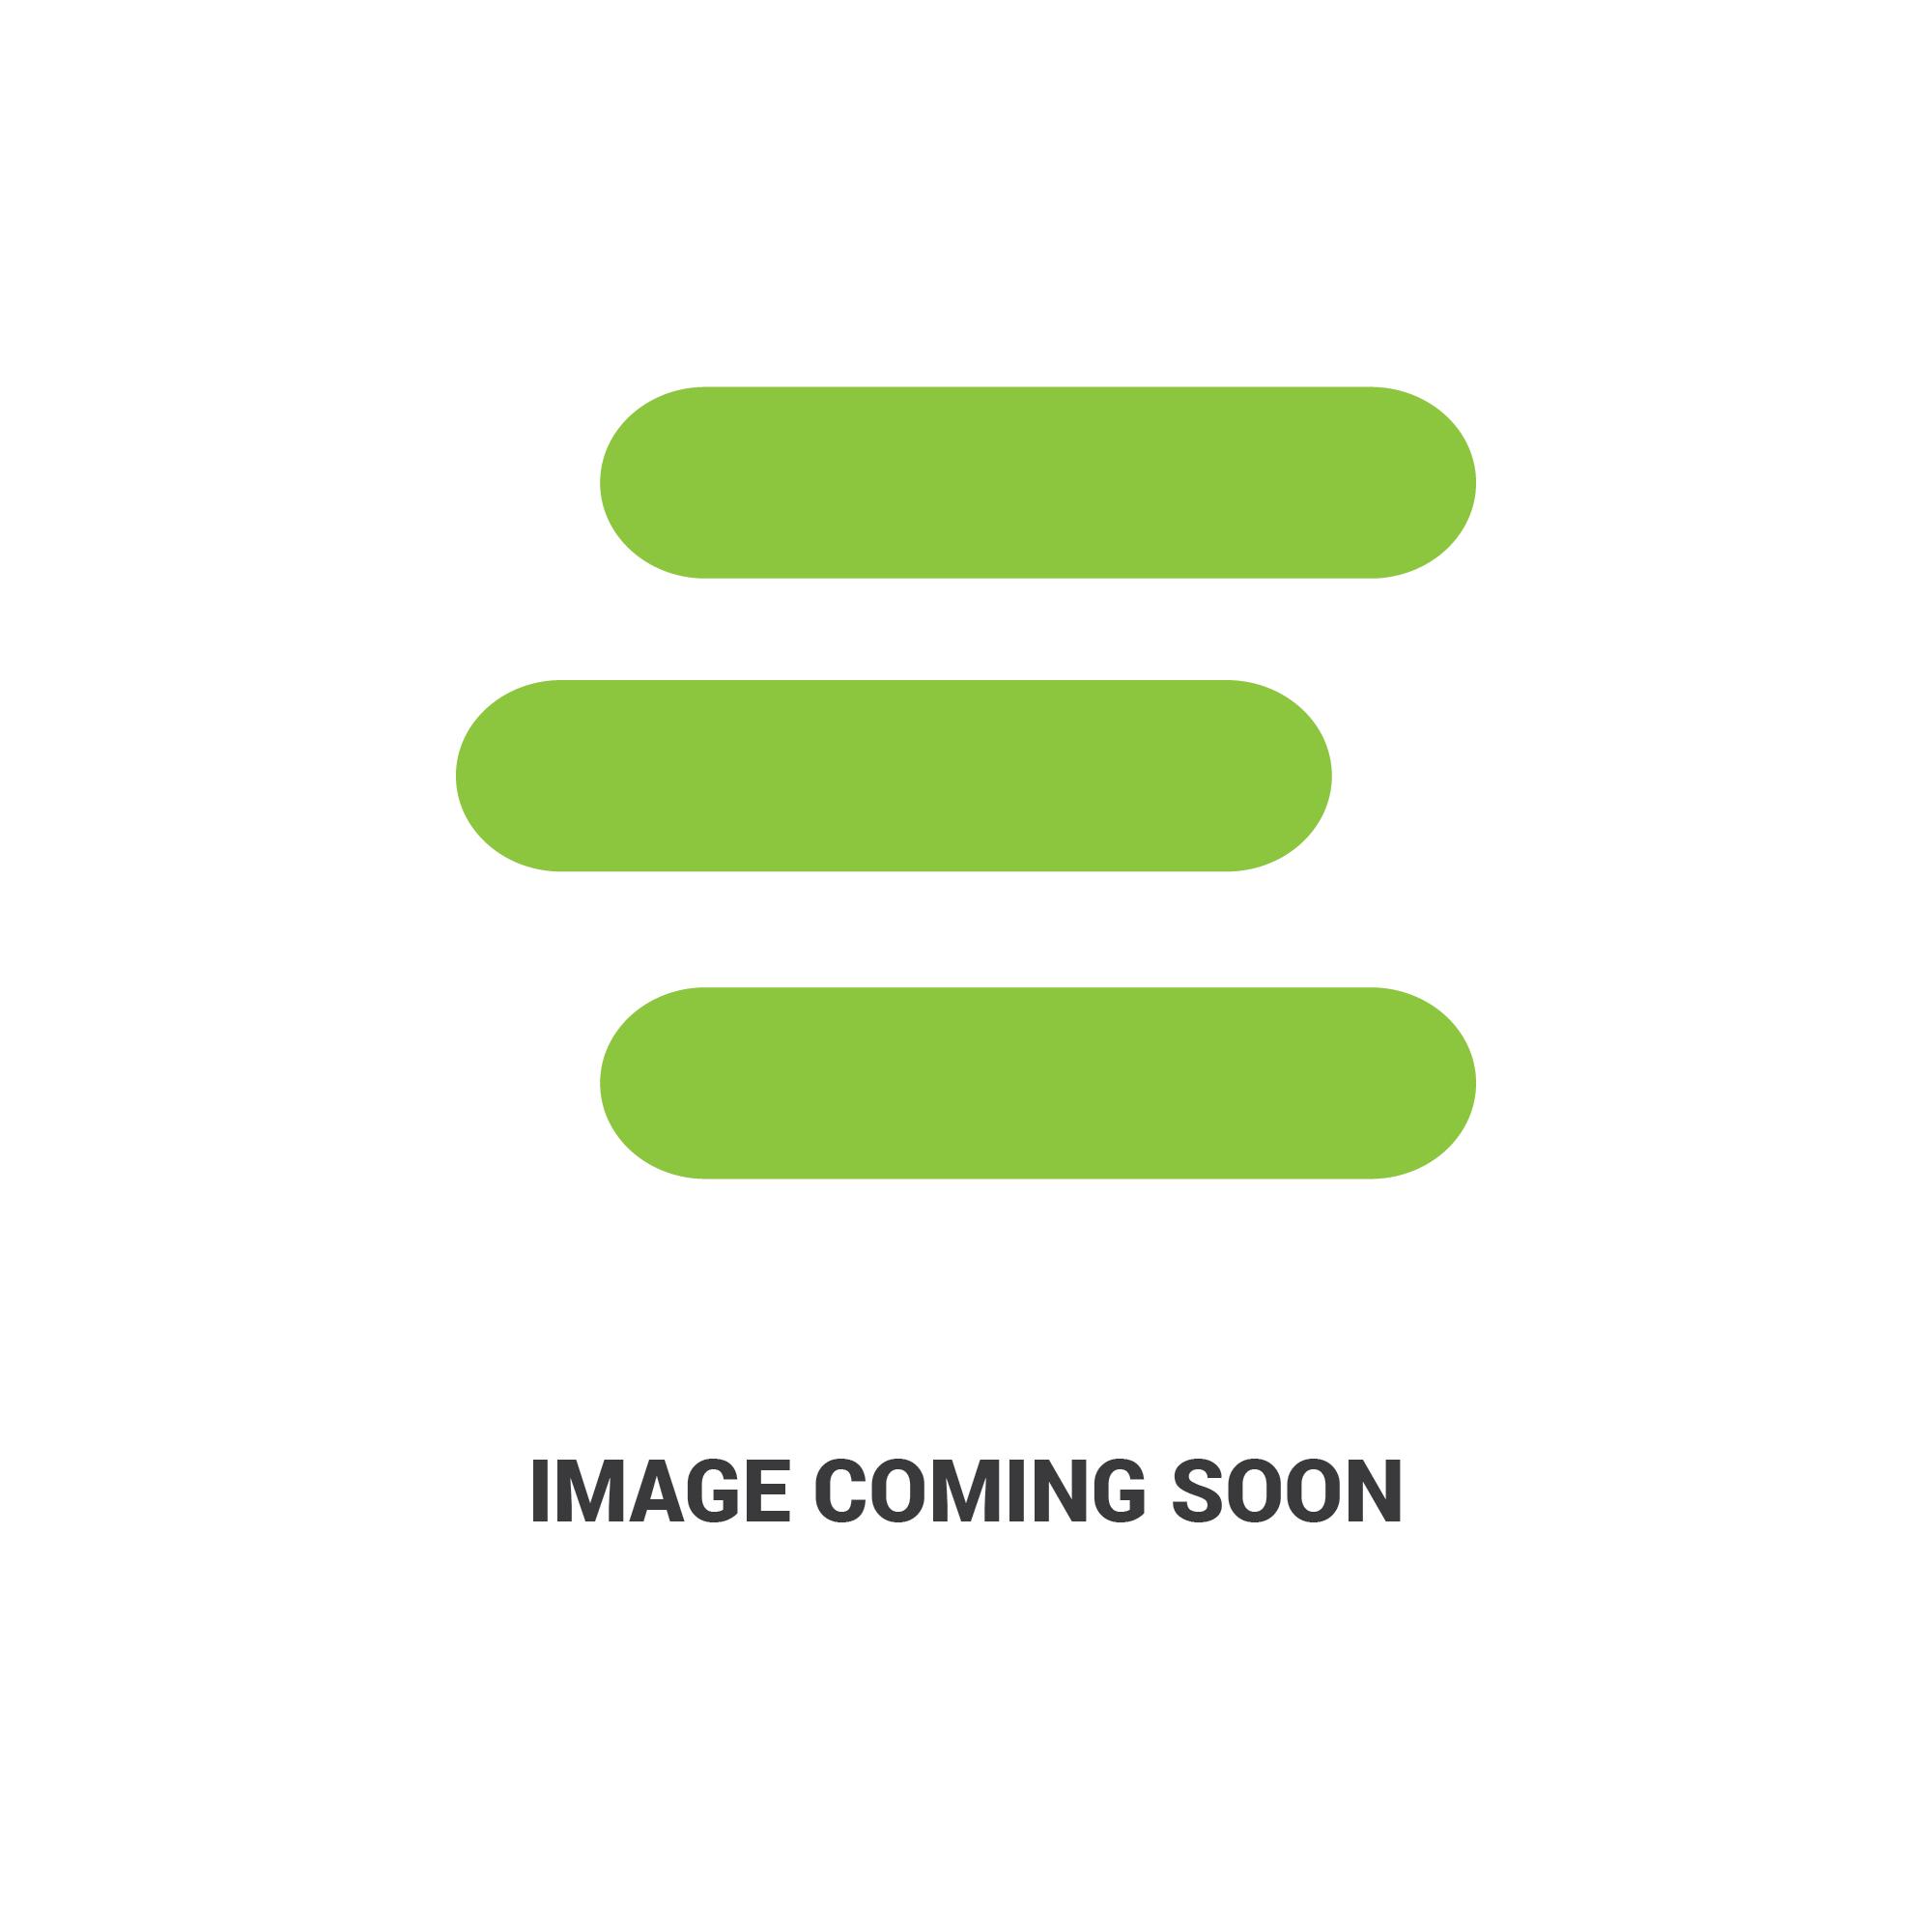 E-15241-320941968_1.jpg